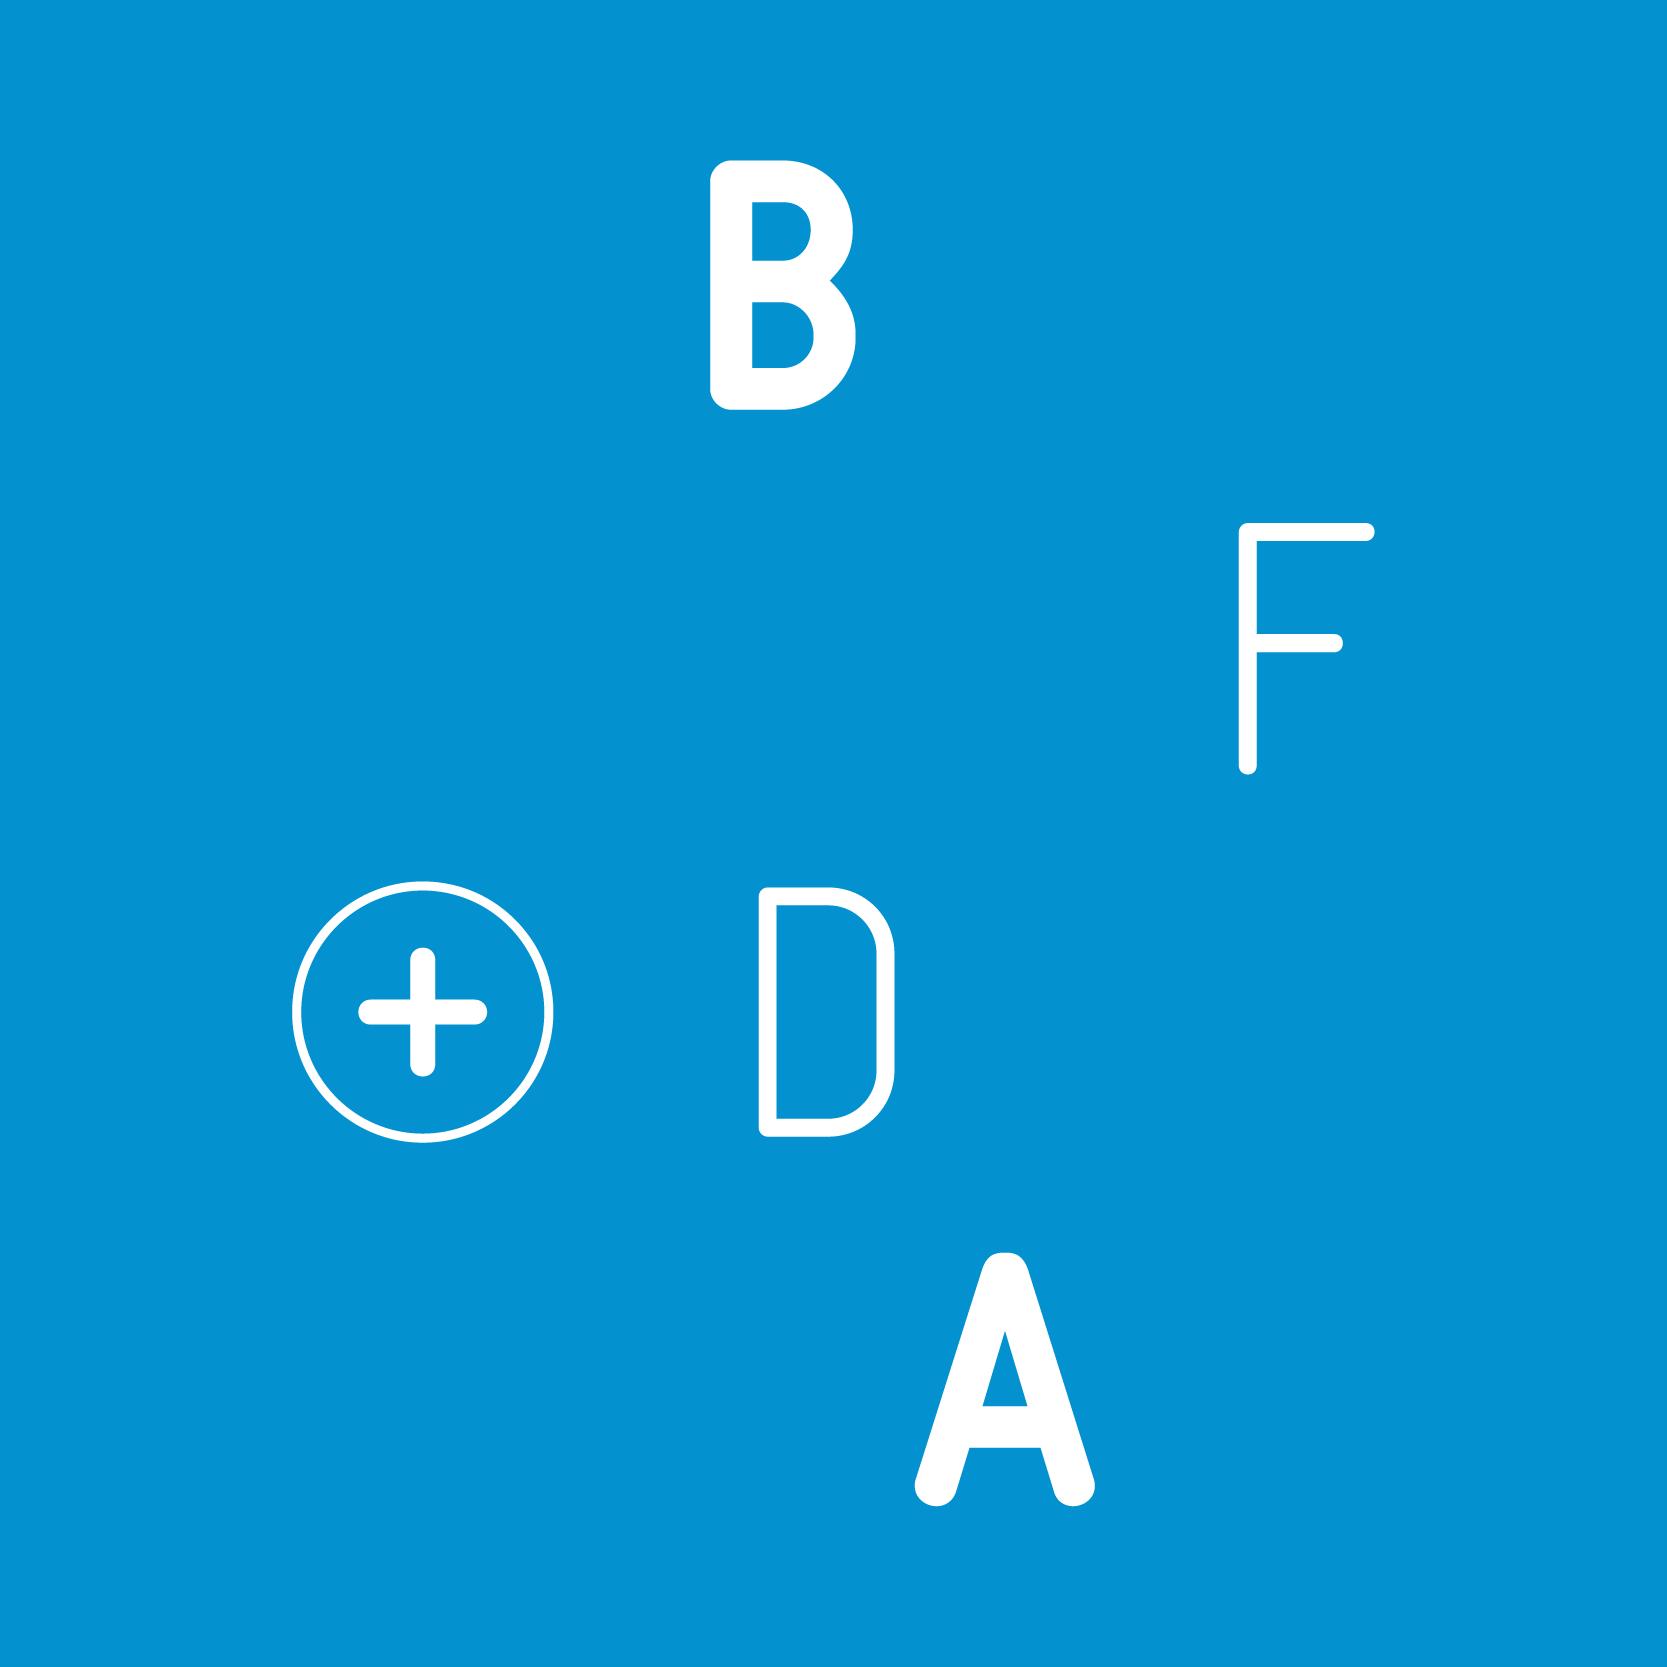 bfda logo.png